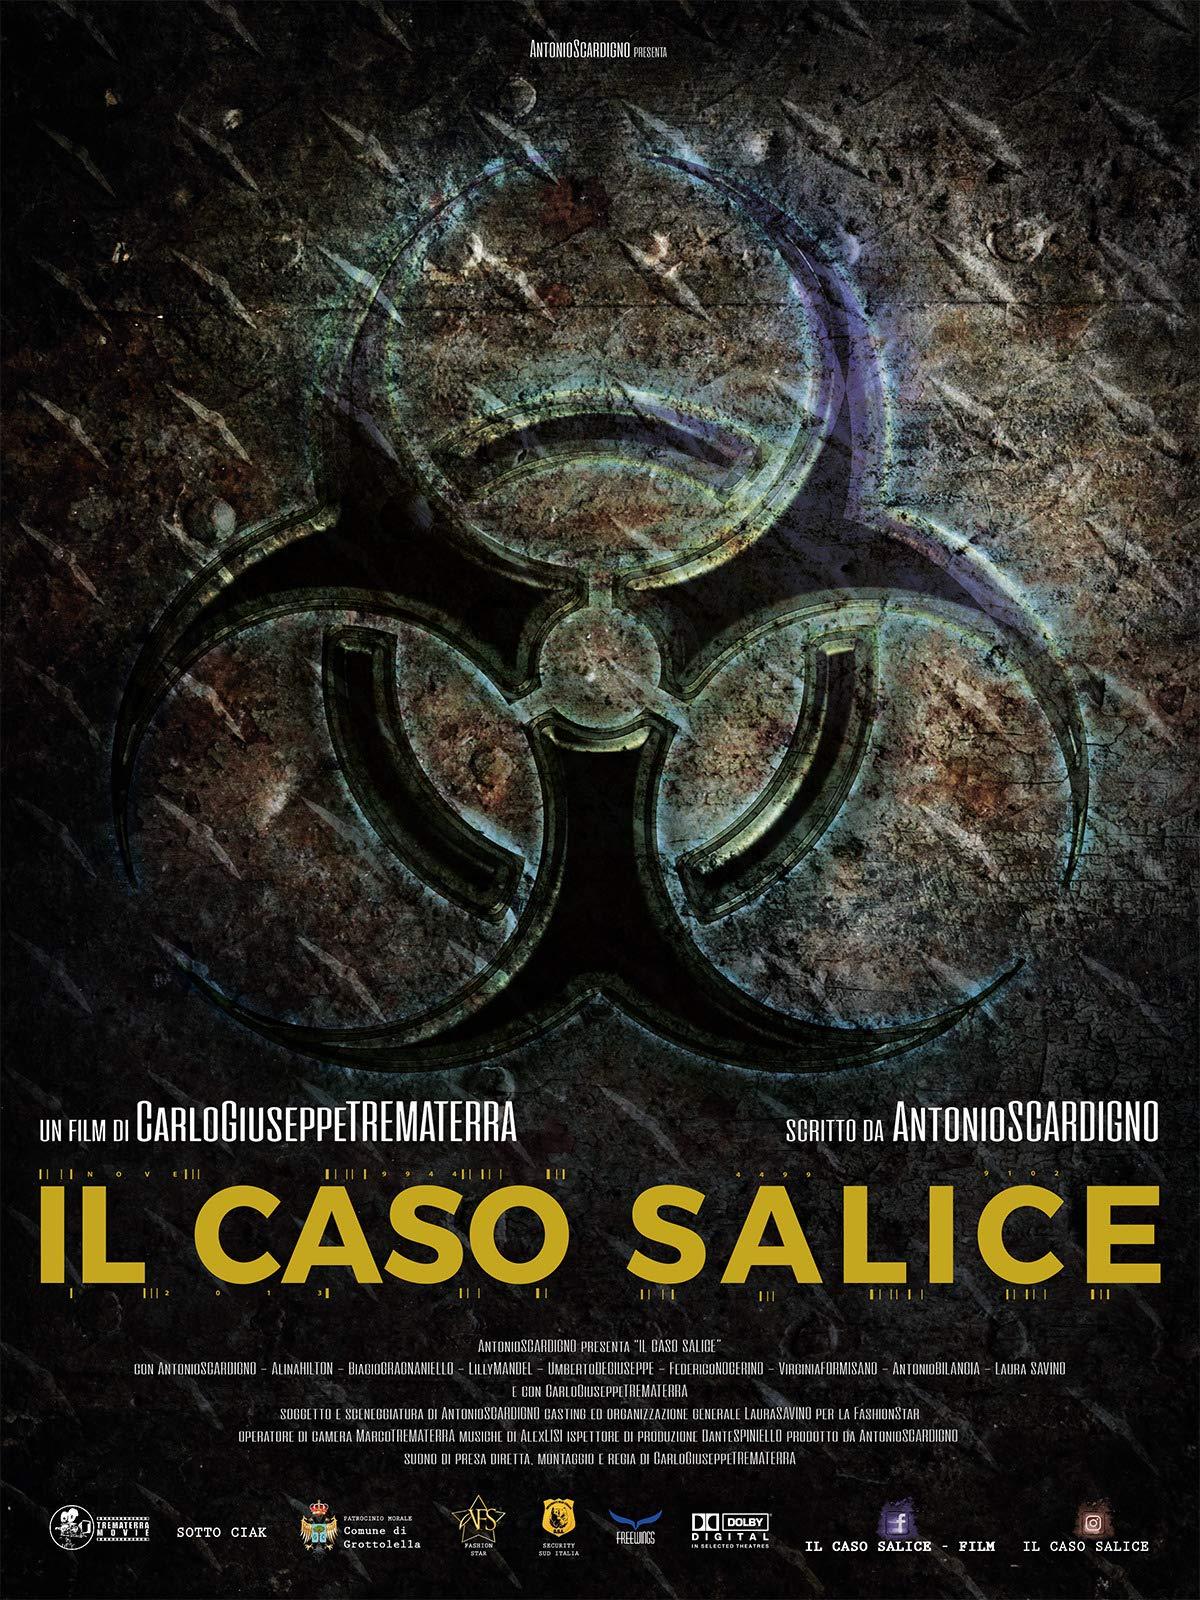 Salice's case (Il caso Salice)